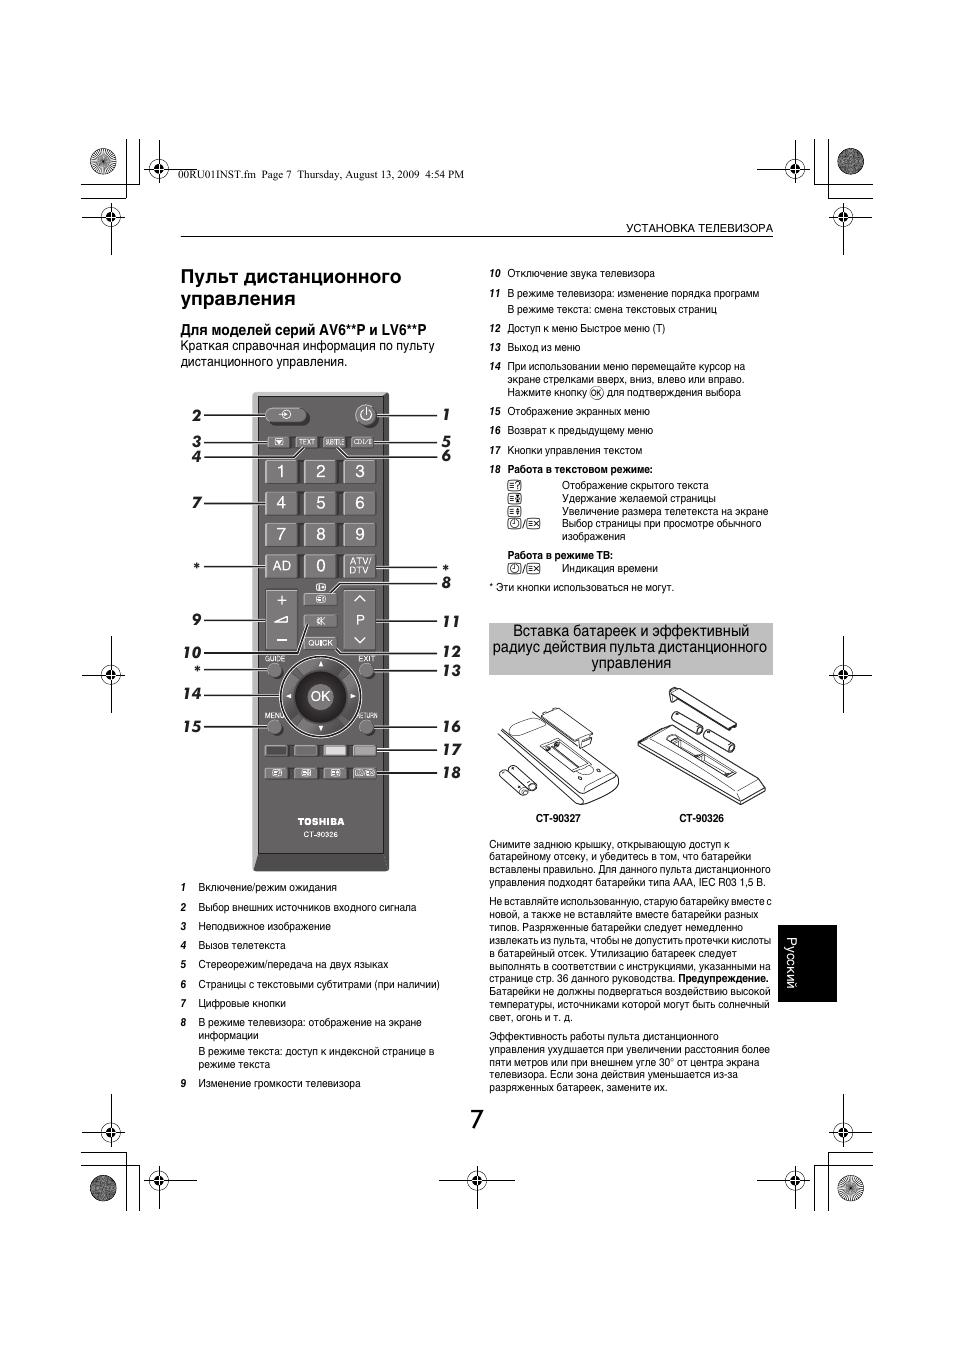 Инструкция телевизора toshiba